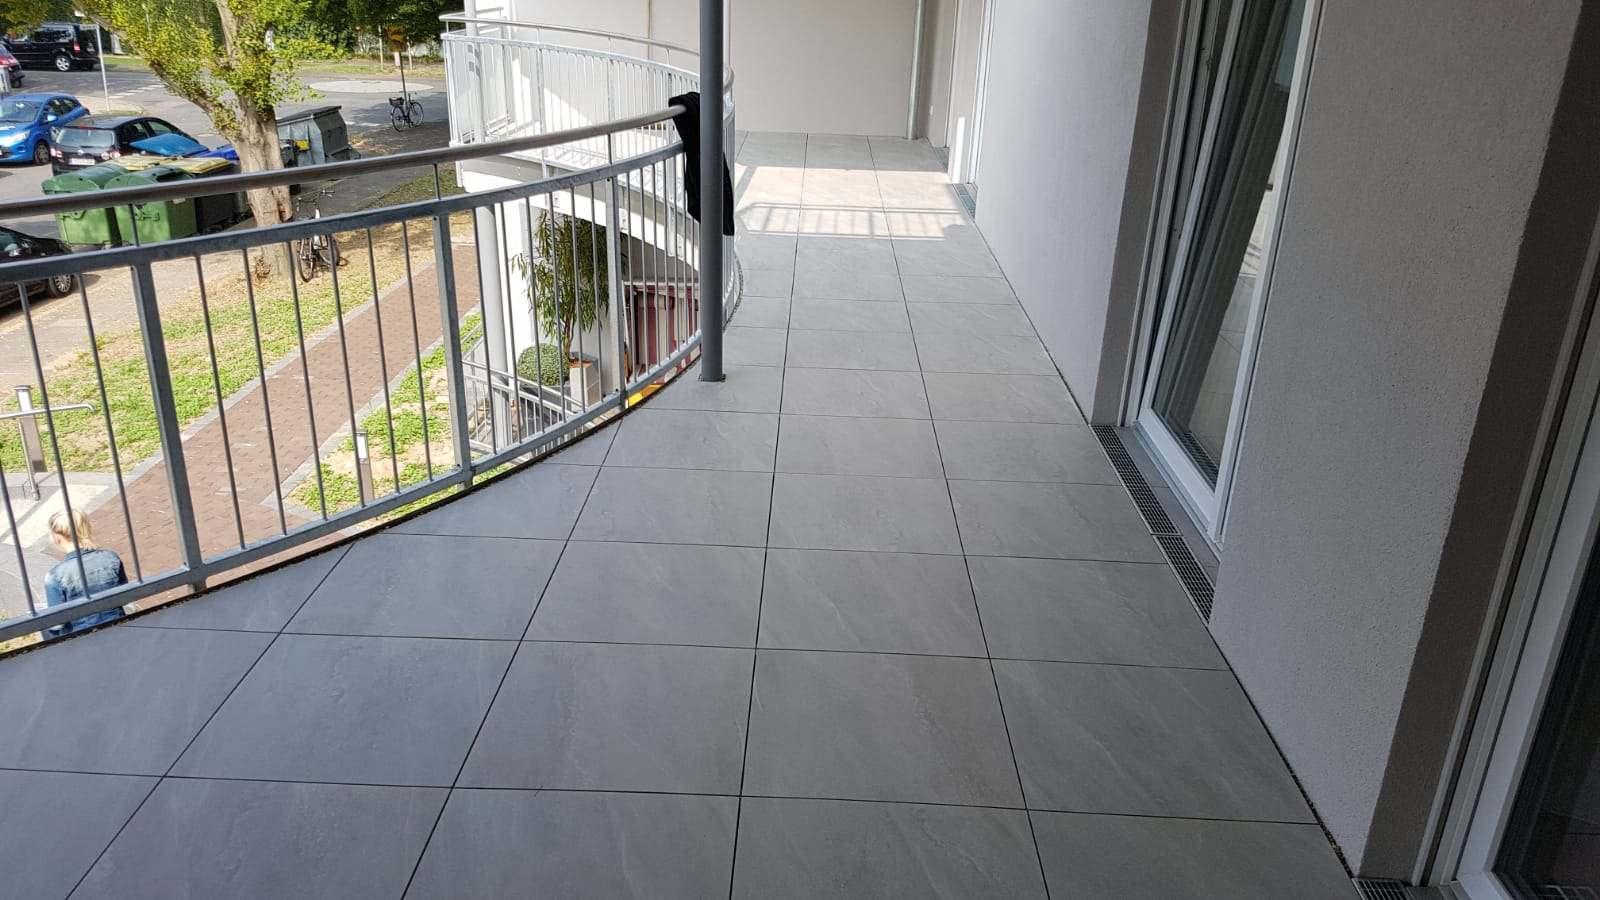 A G Naturstein Gmbh Keramik Terrassenplatten 2 0